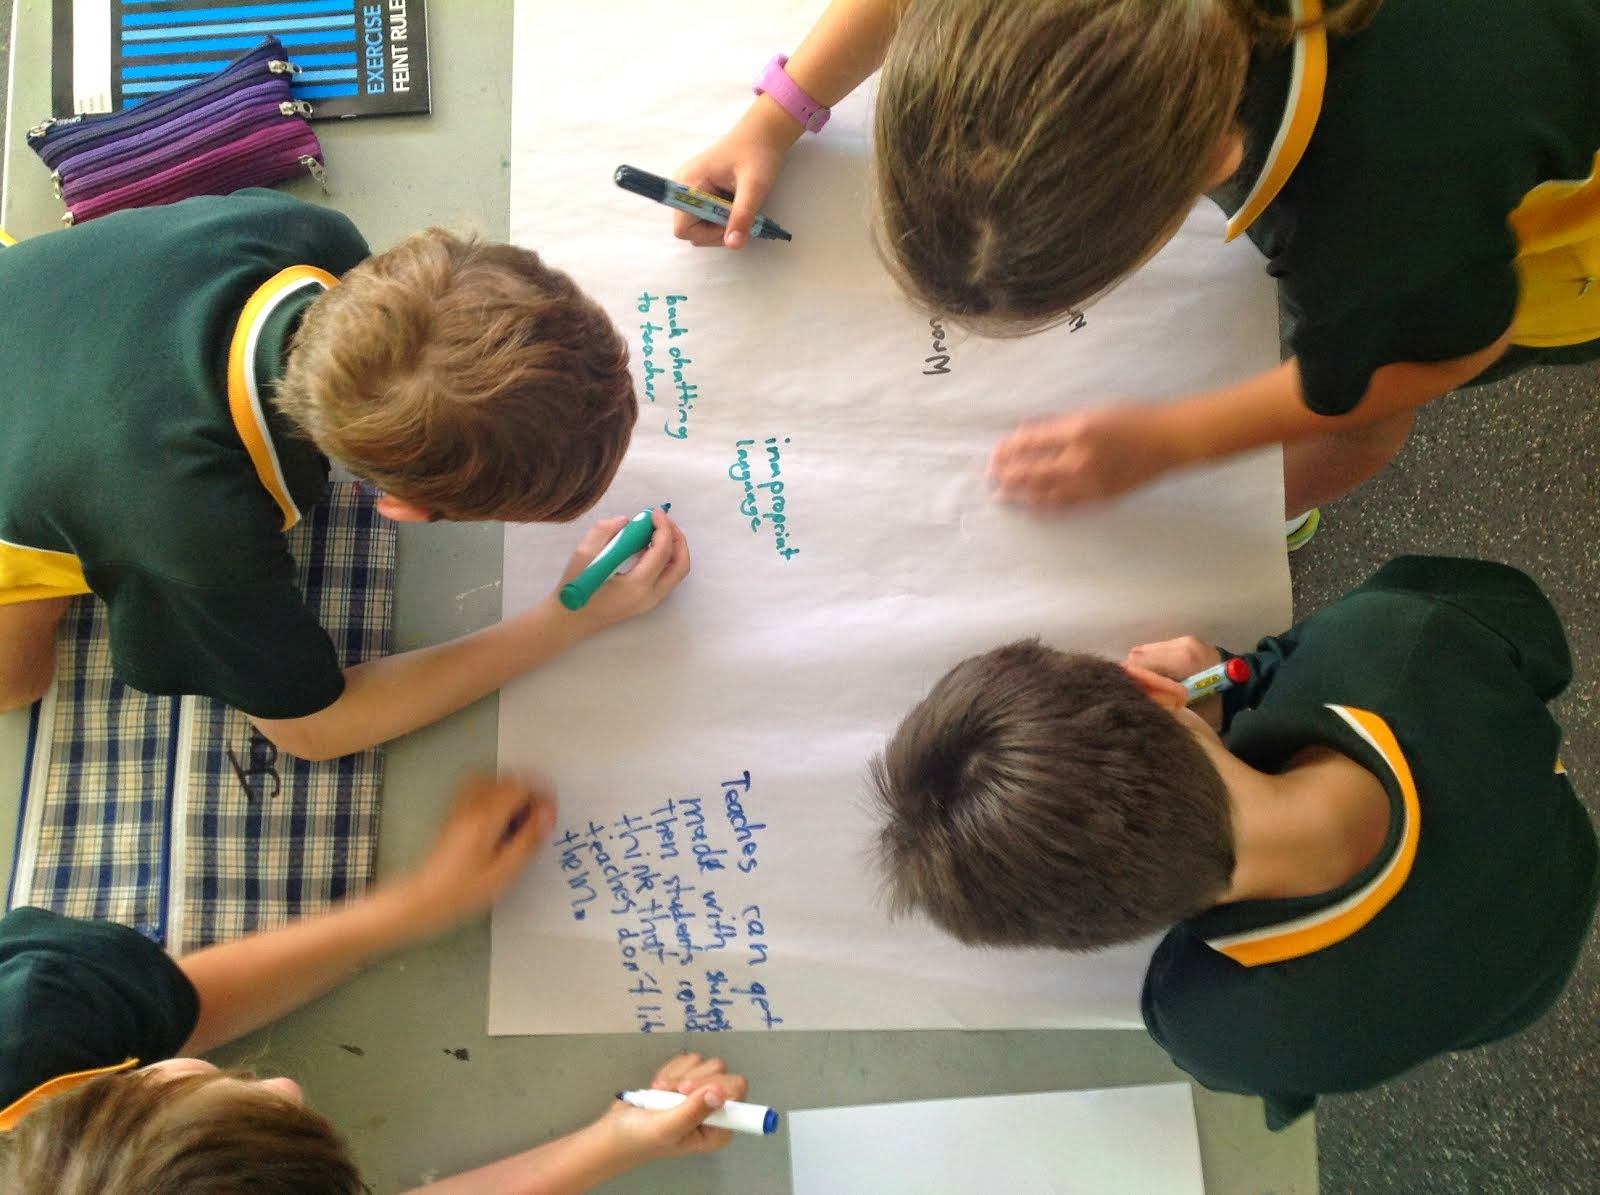 Primary brainstorm